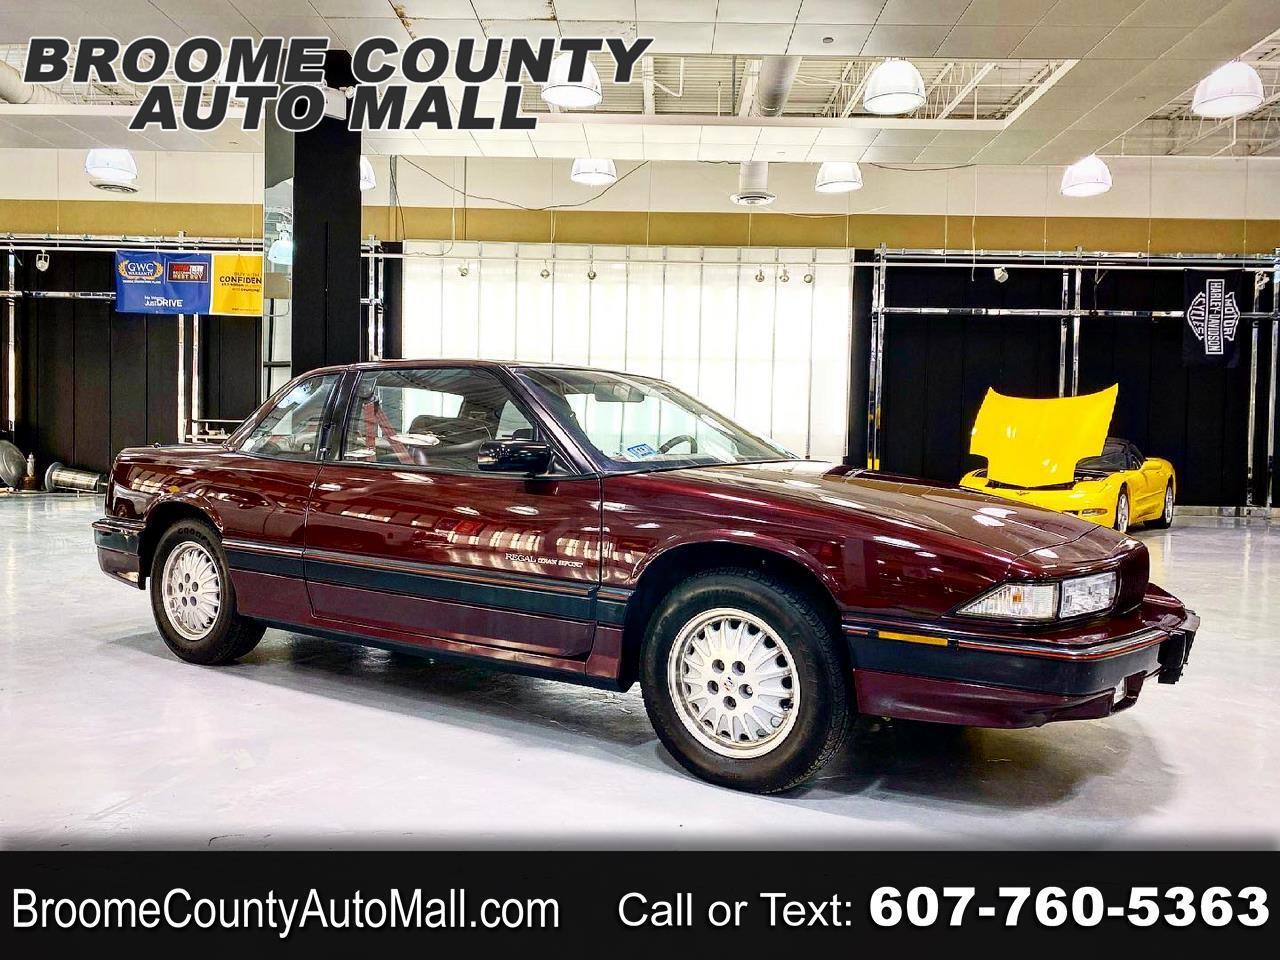 Buick Regal Gran Sport coupe 1992